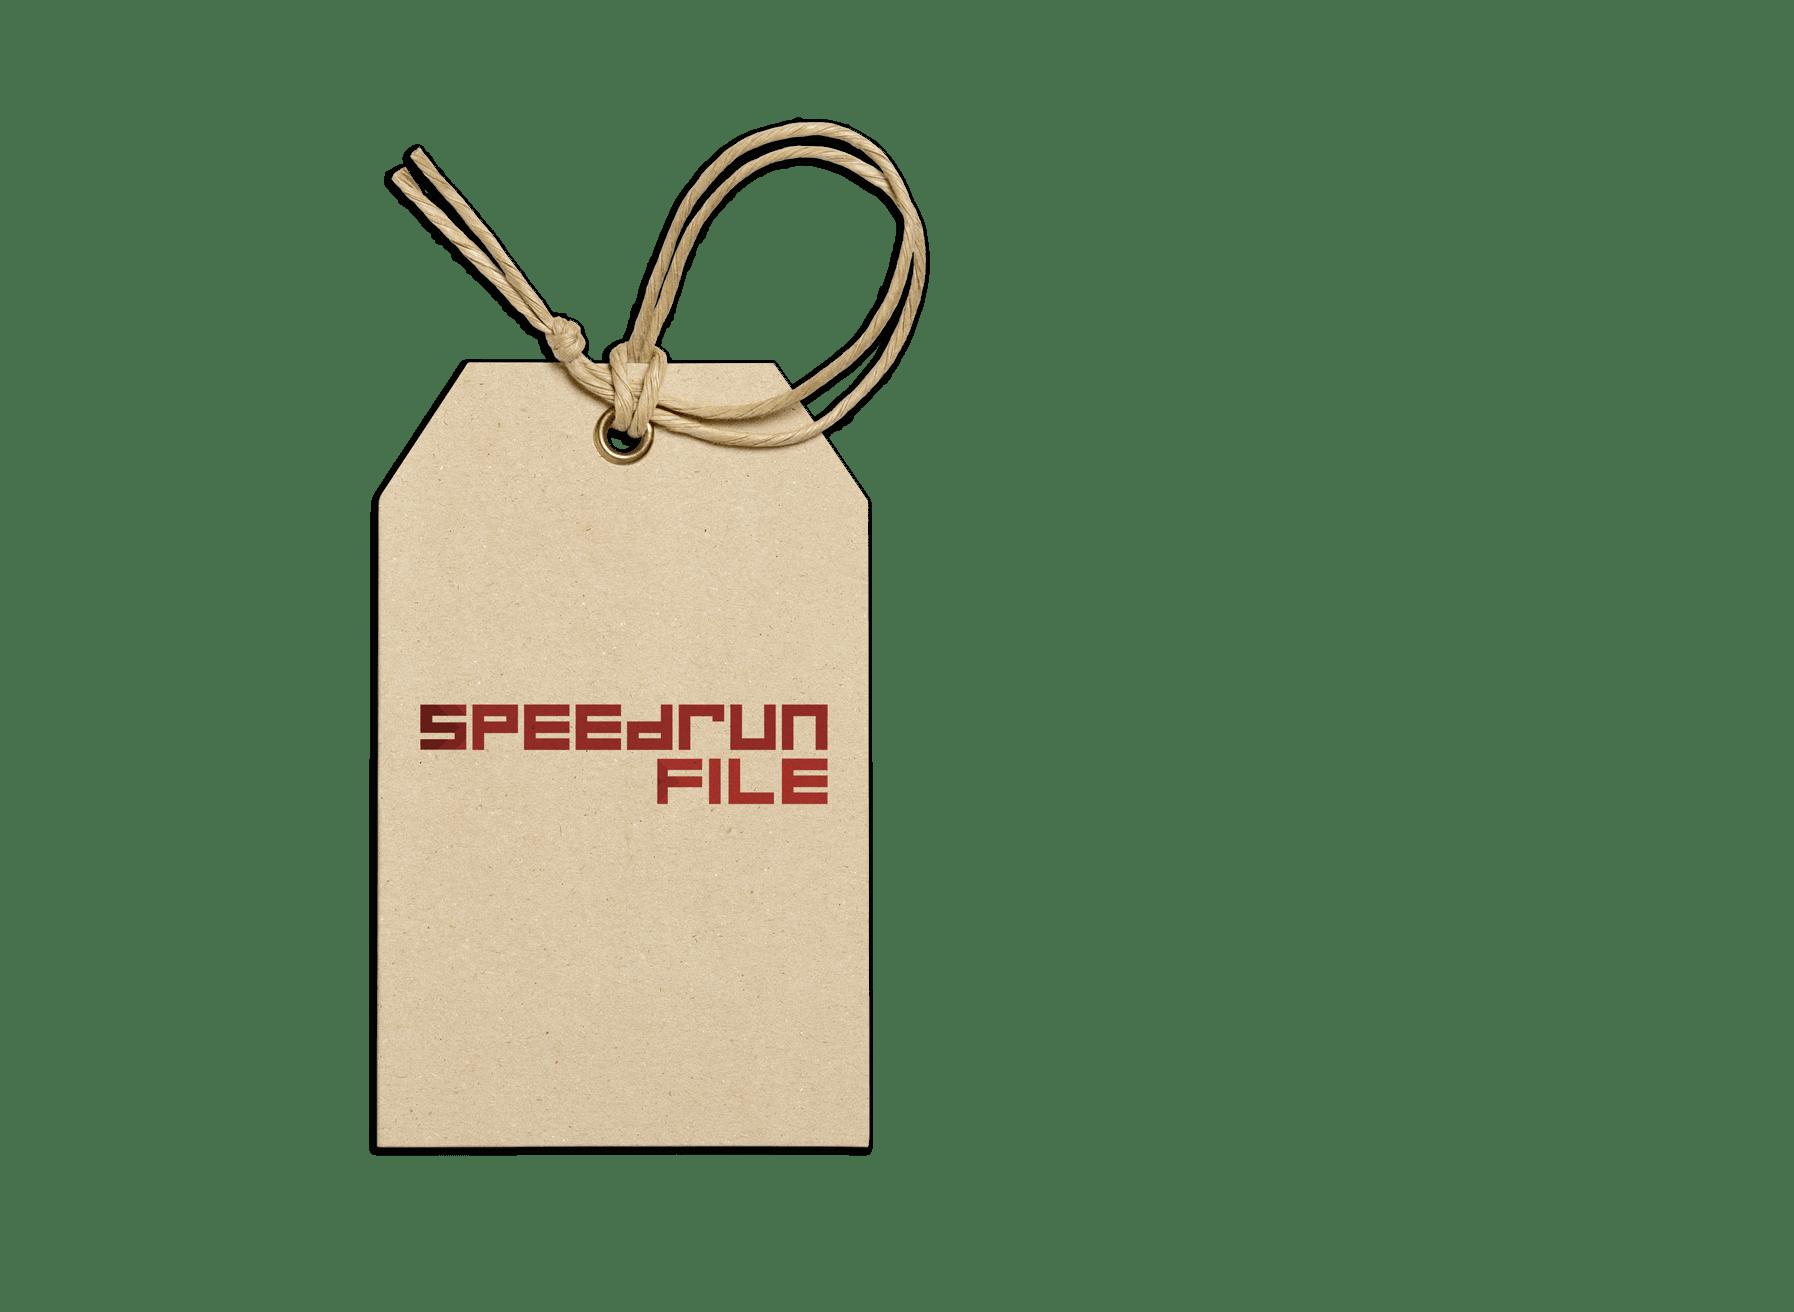 speedrun-file-creation-logo